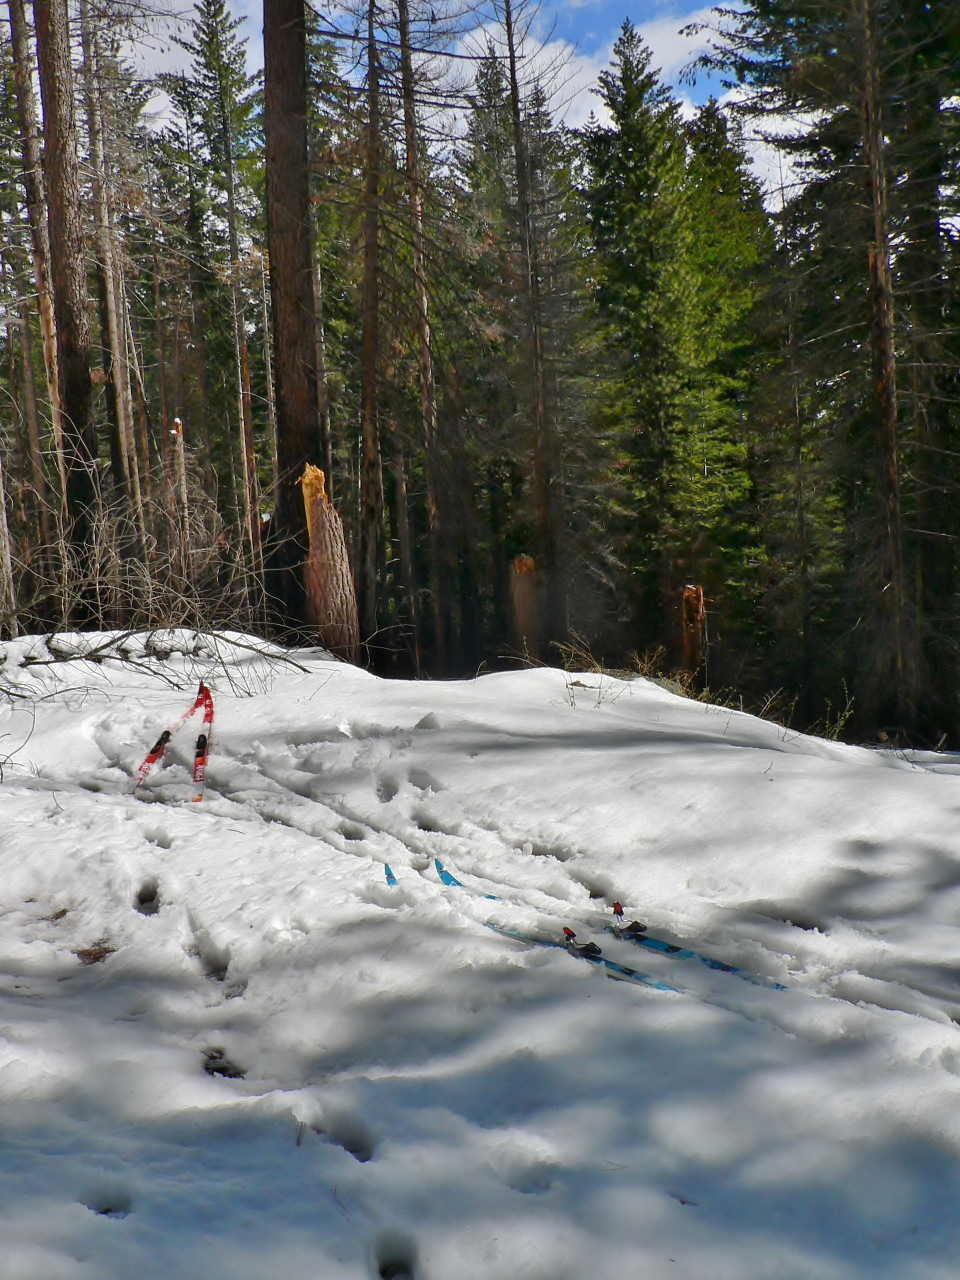 Rockefeller Grove Yosemite Sugar Pines Skiing Amp Fire